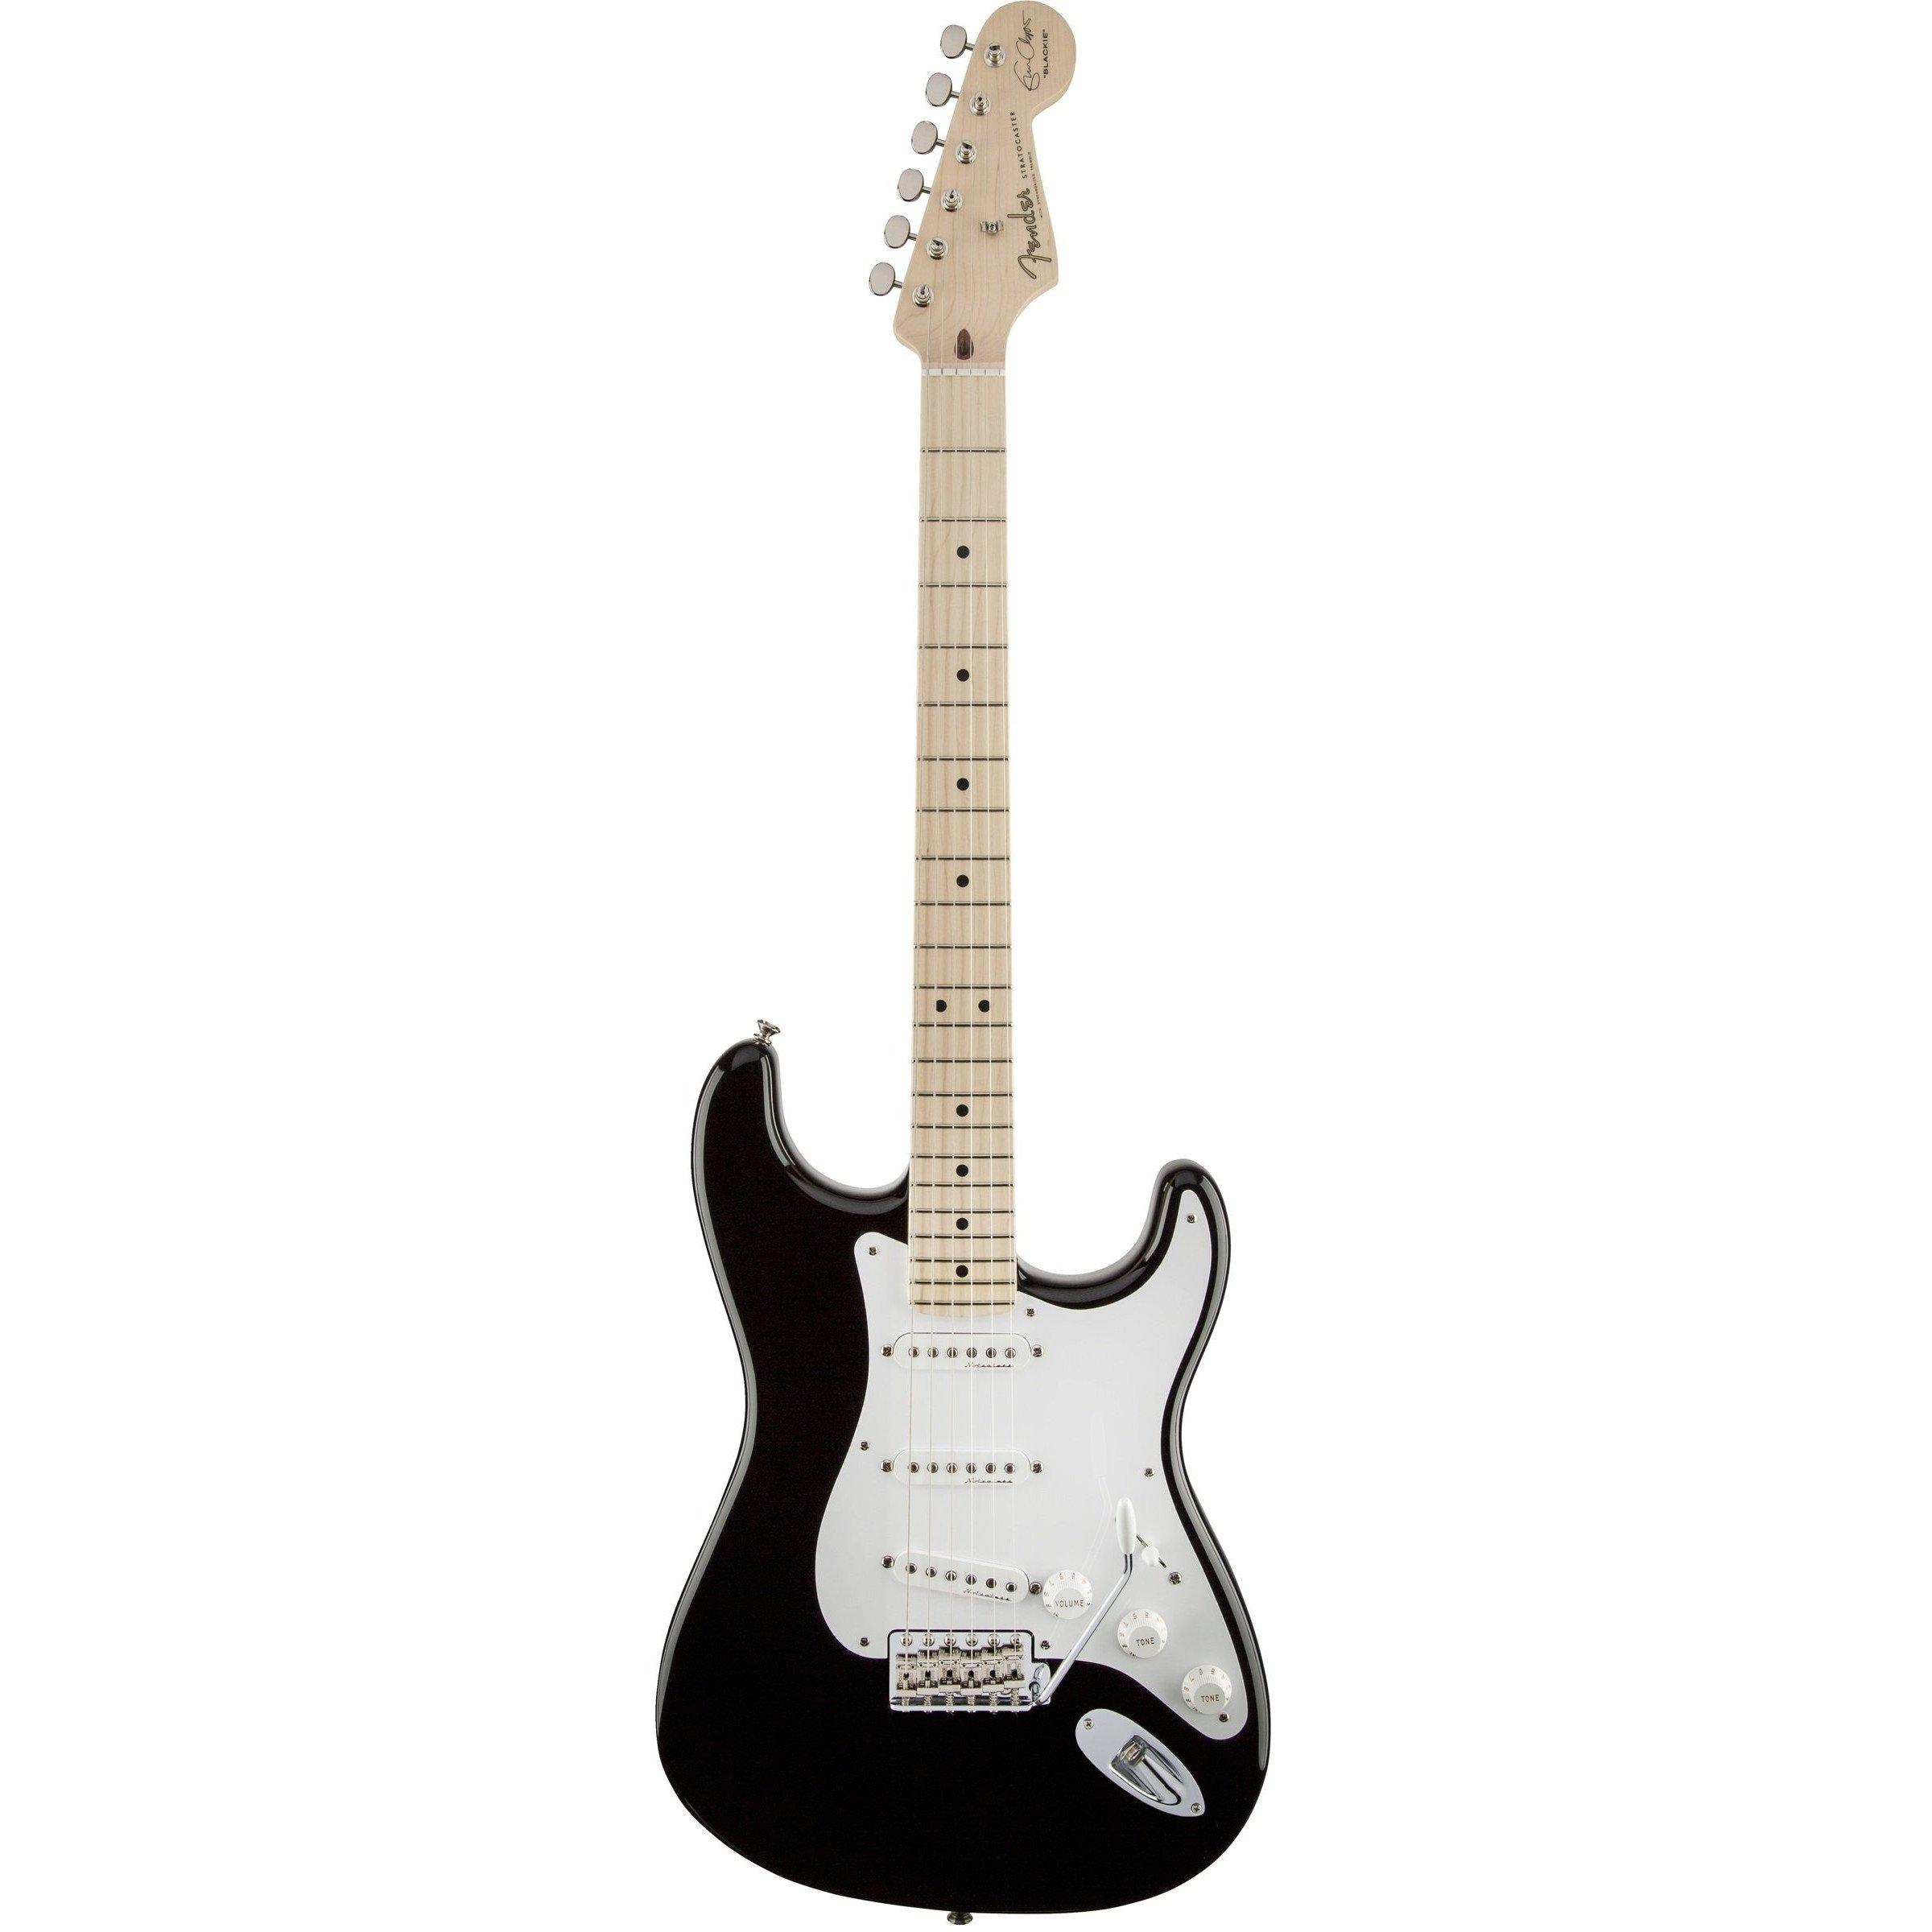 Fender Eric Clapton Blackie Stratocaster Signature Guitar   PMT Online